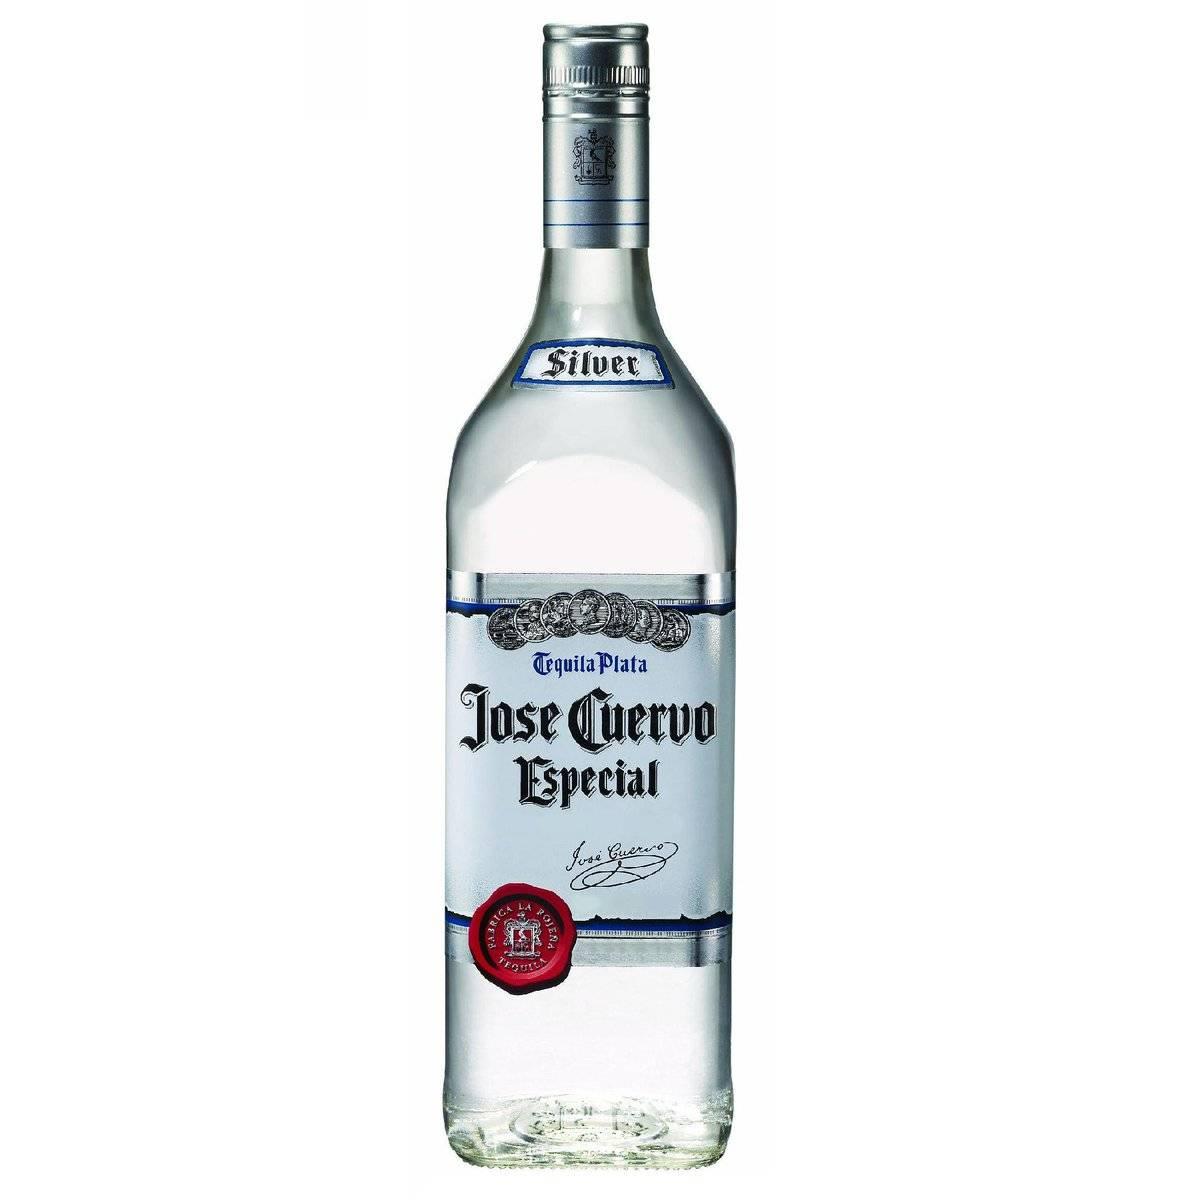 Jose cuervo (хосе куэрво)